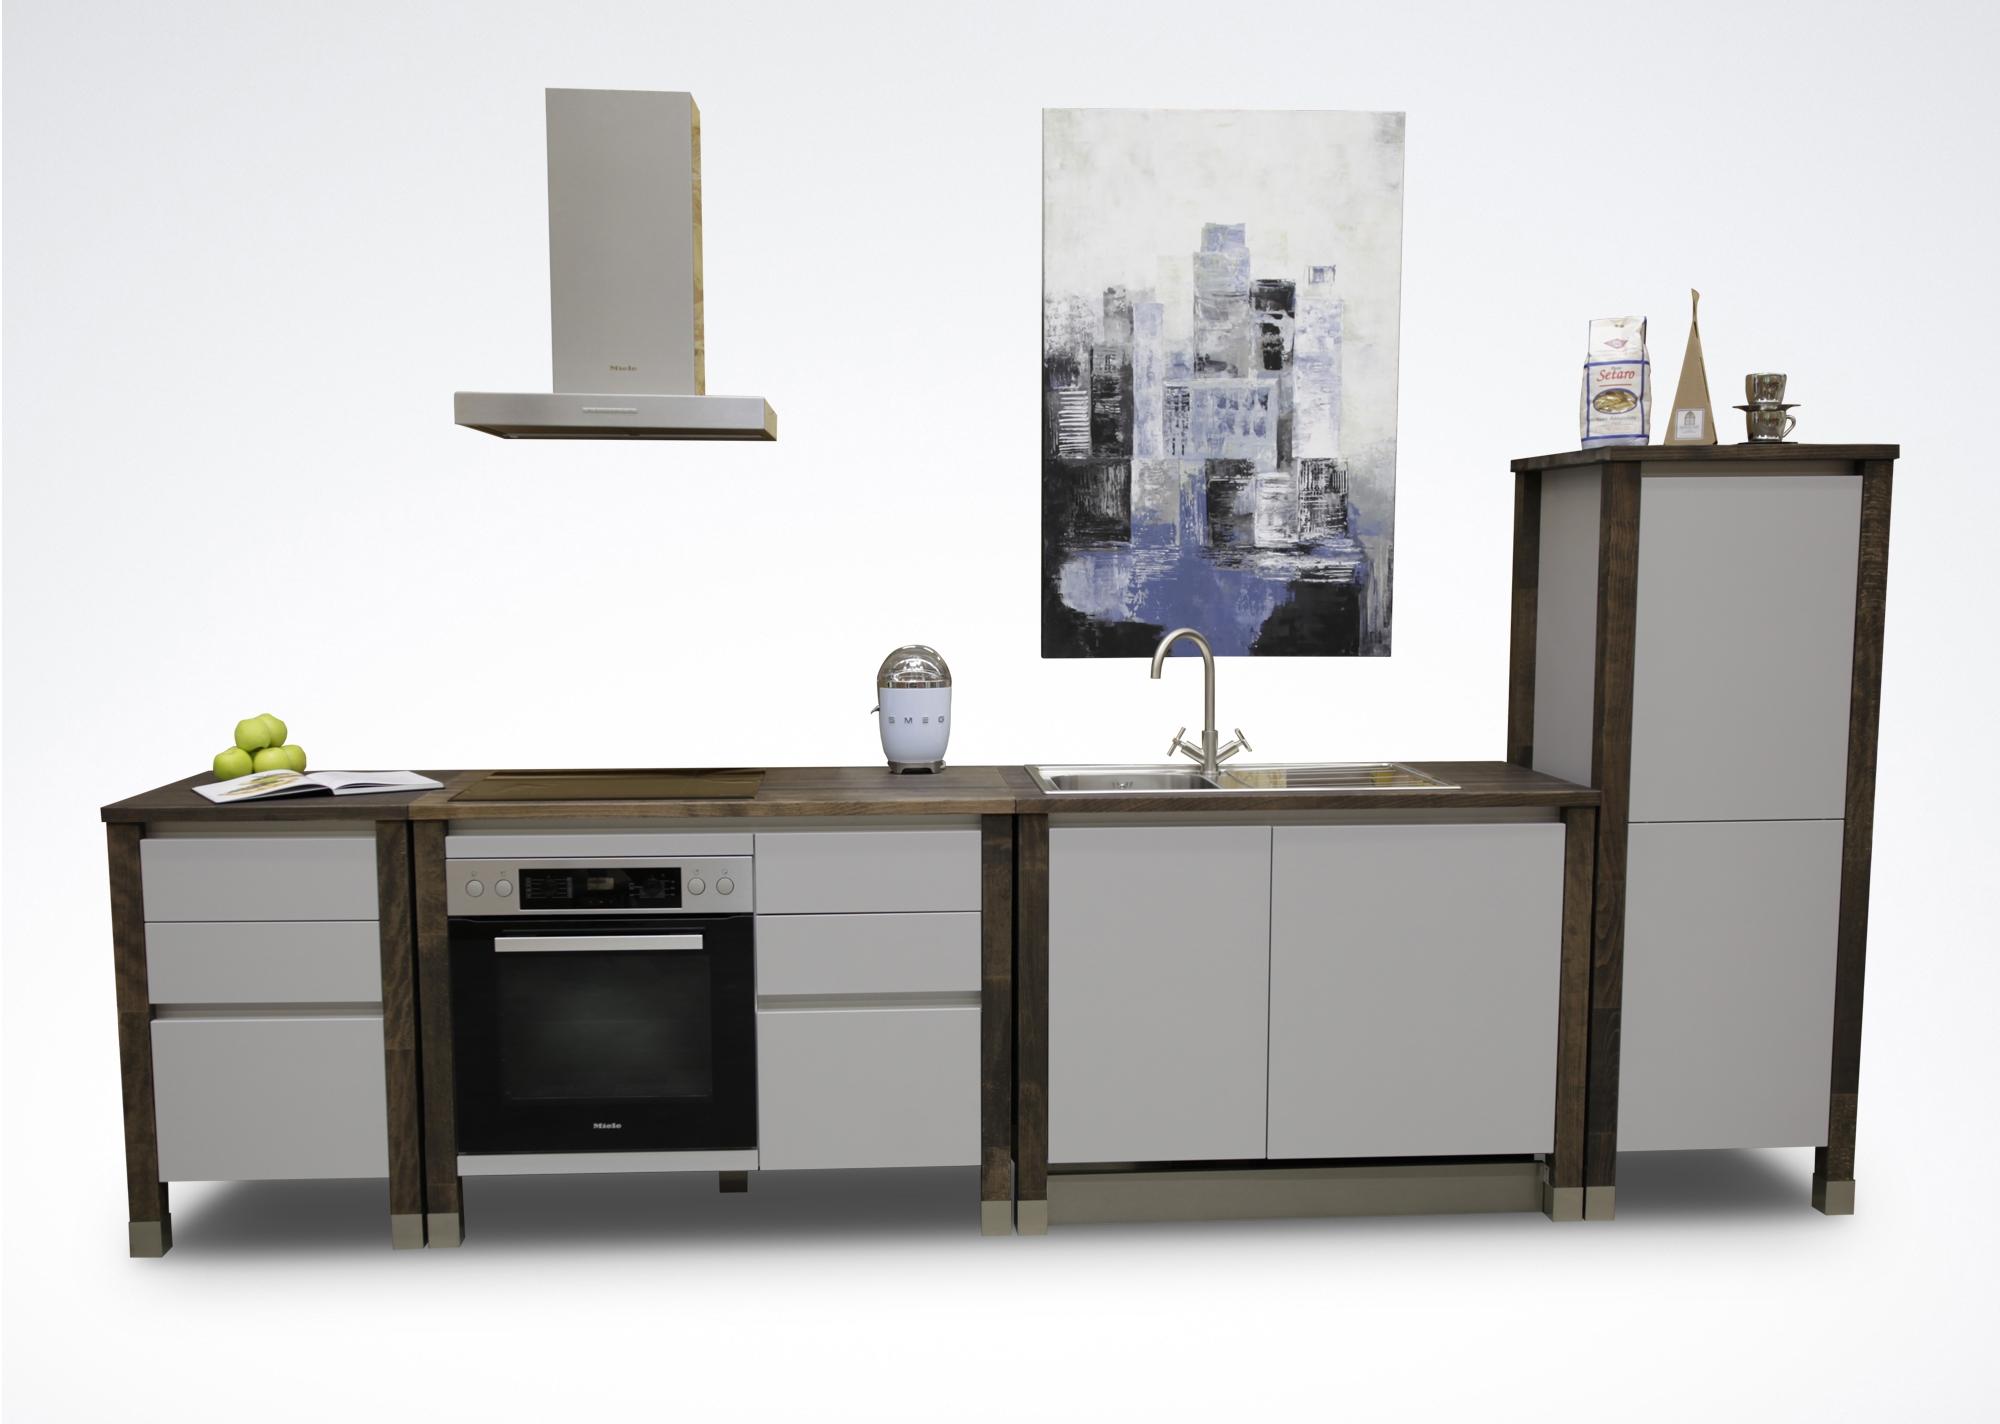 Full Size of Modulküchen Modulkchen Bloc Modulkche Wohnzimmer Modulküchen